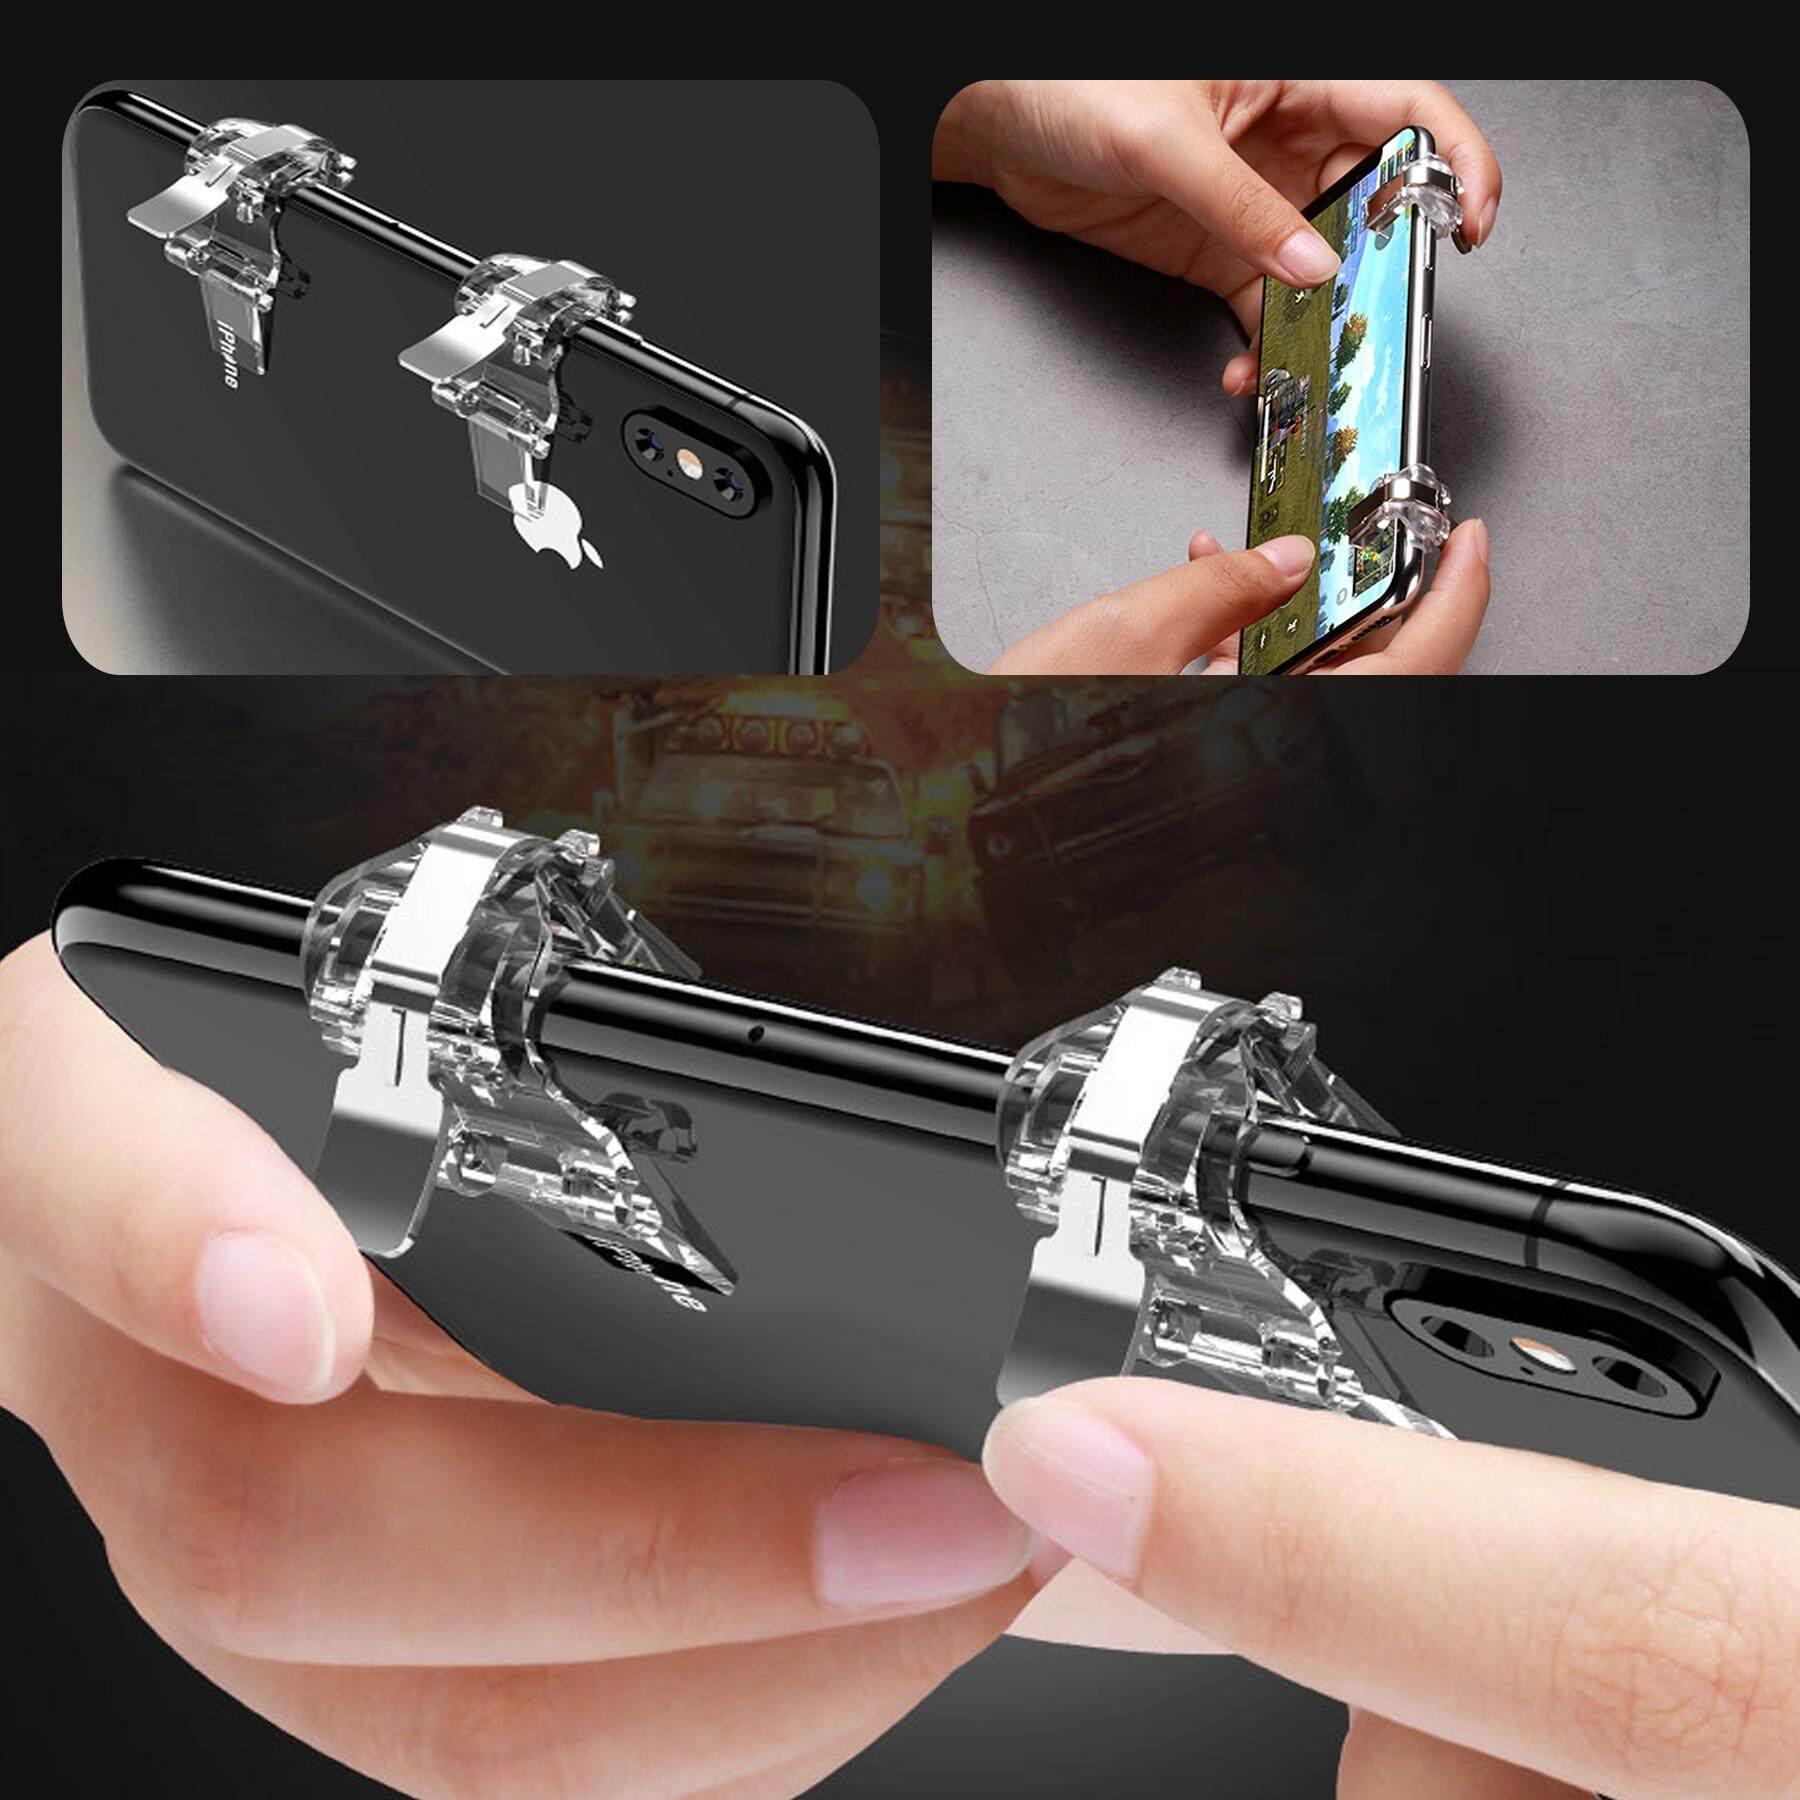 Mobile Joystick จอยสติ๊ก ตัวช่วยยิงเกมแนว Pubg / Free Fire / Rules Of Survival รุ่นใหม่ Game Mobile Pubg เกมยิง Shooting Tap เกมโดดร่ม.